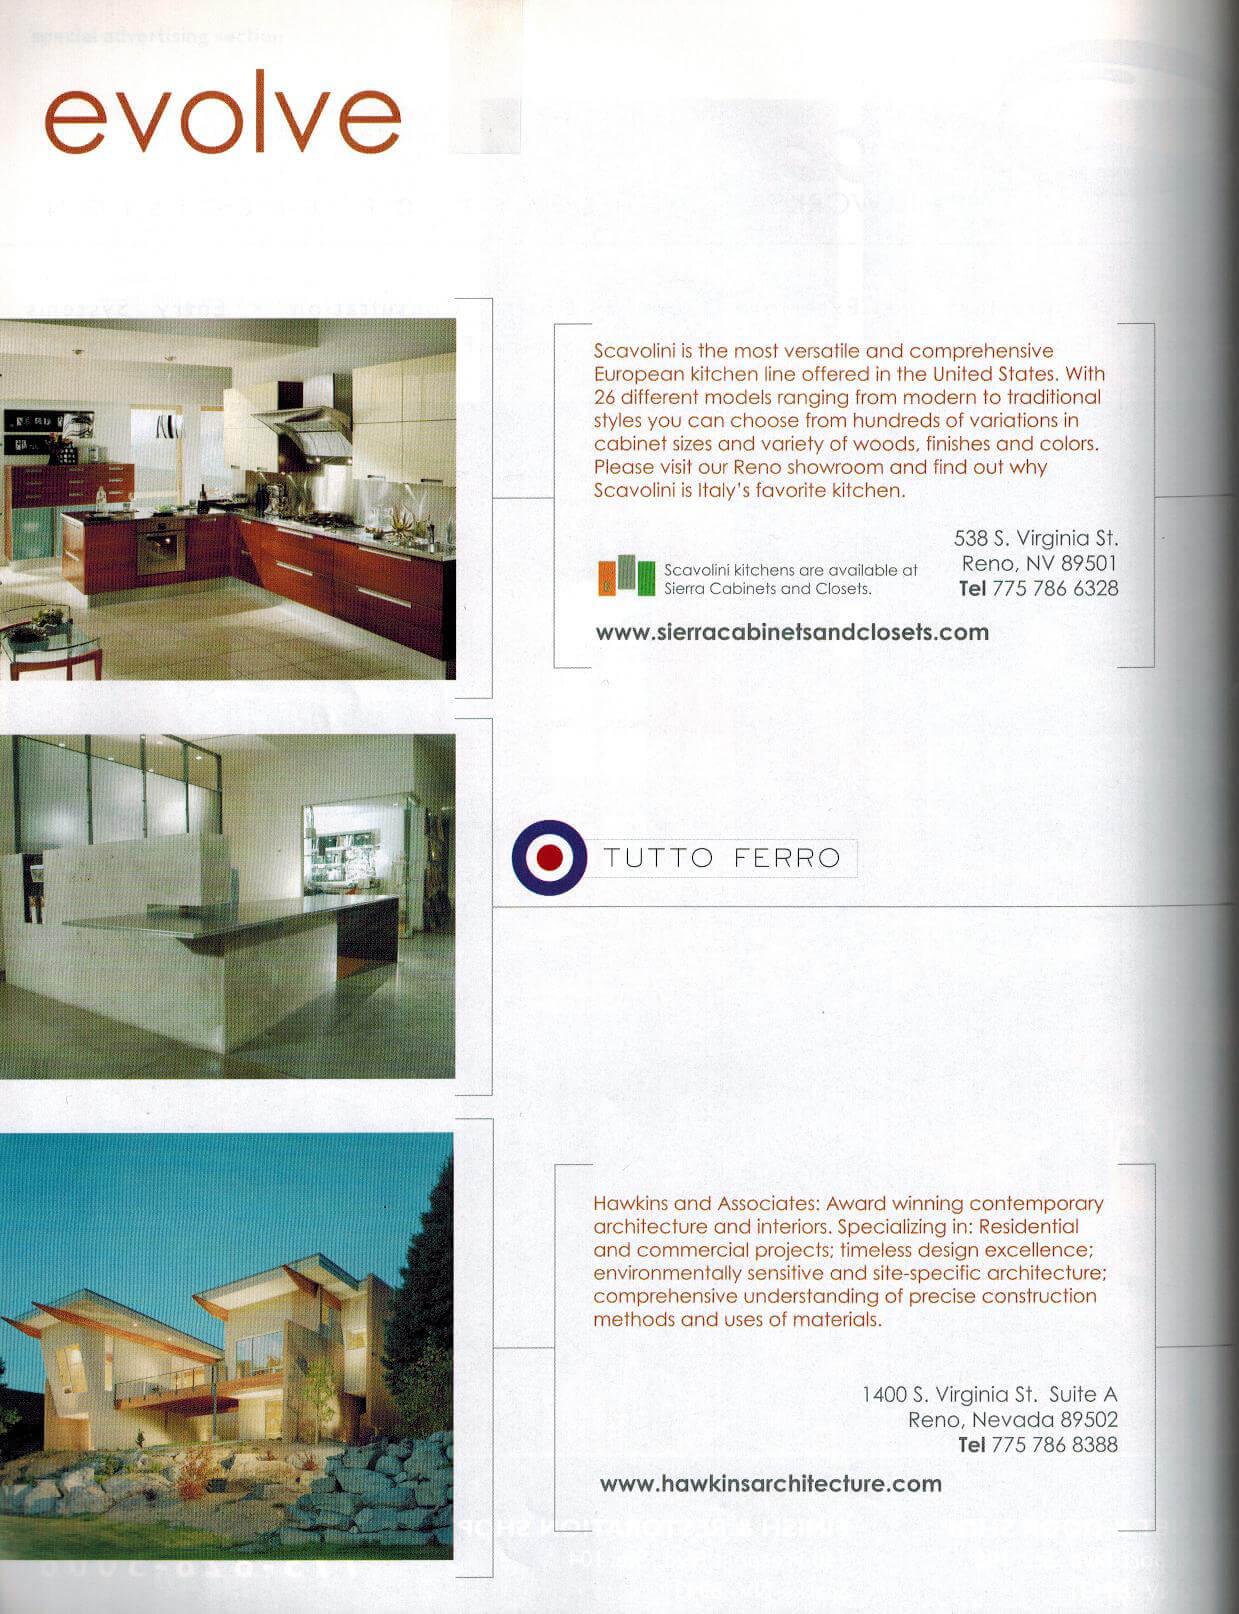 Tahoe Quarterly 2005 - Stremmel Gallery0003